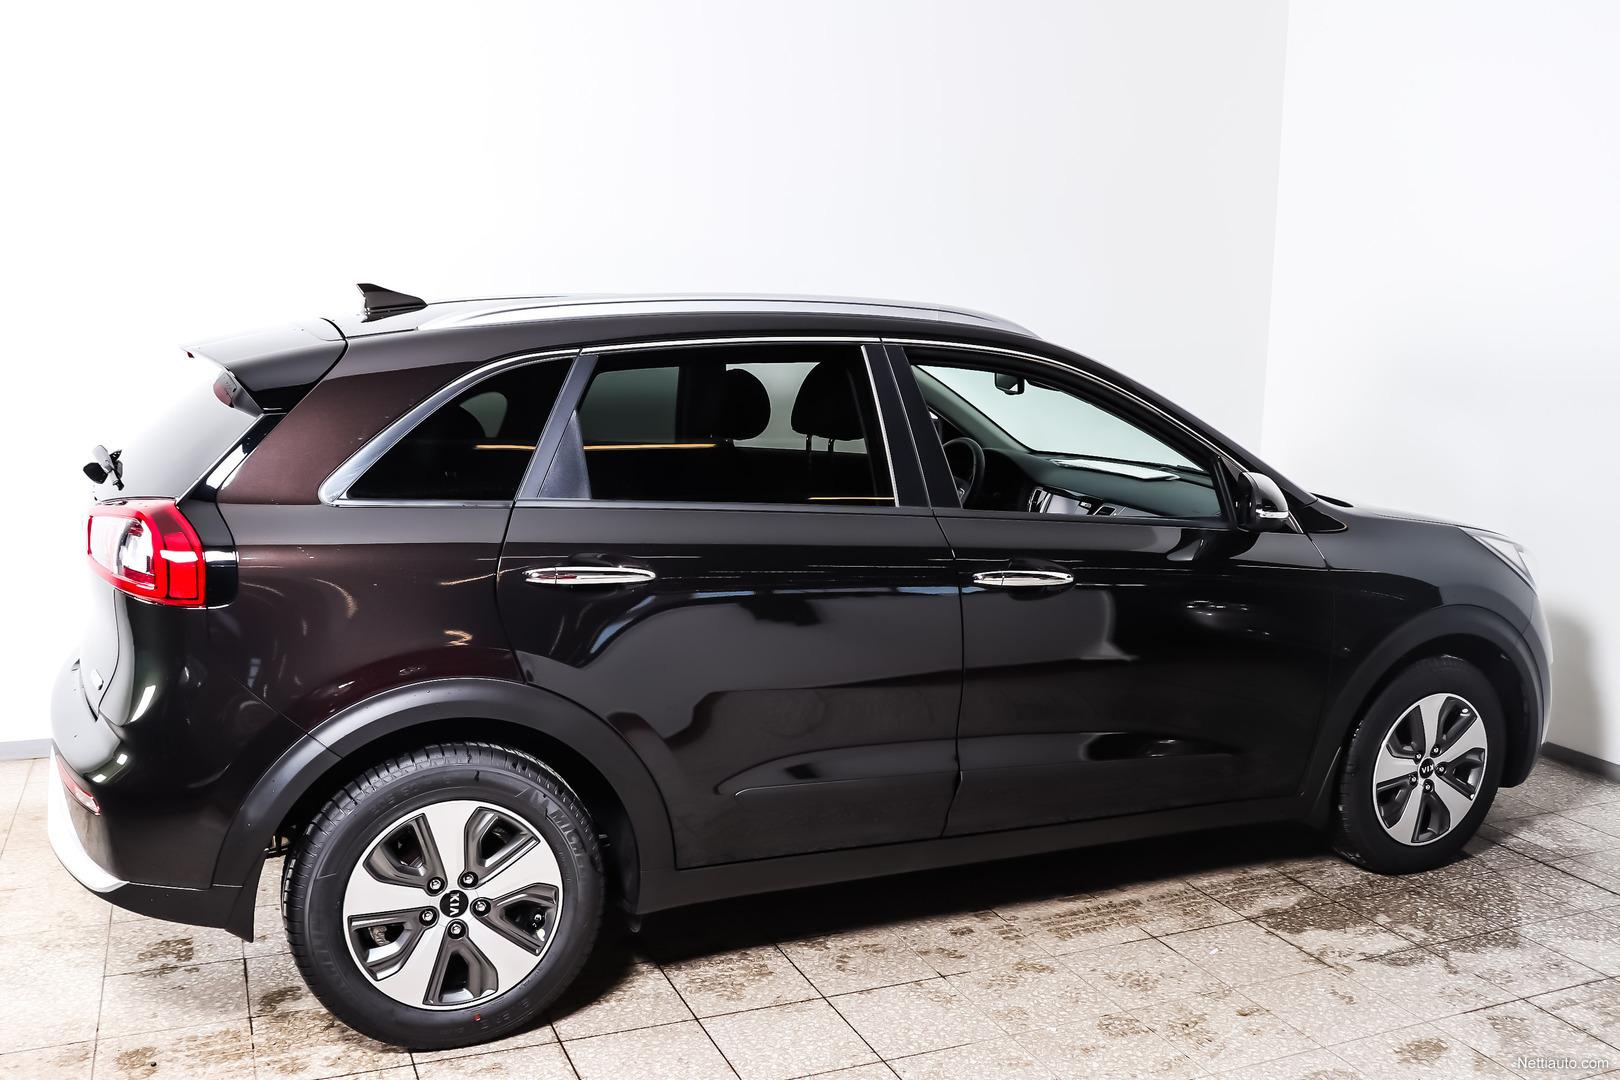 kia niro 1 6 gdi hybrid edition dct tehdastakuu 7 v 150 000 km farmari 2019 vaihtoauto. Black Bedroom Furniture Sets. Home Design Ideas